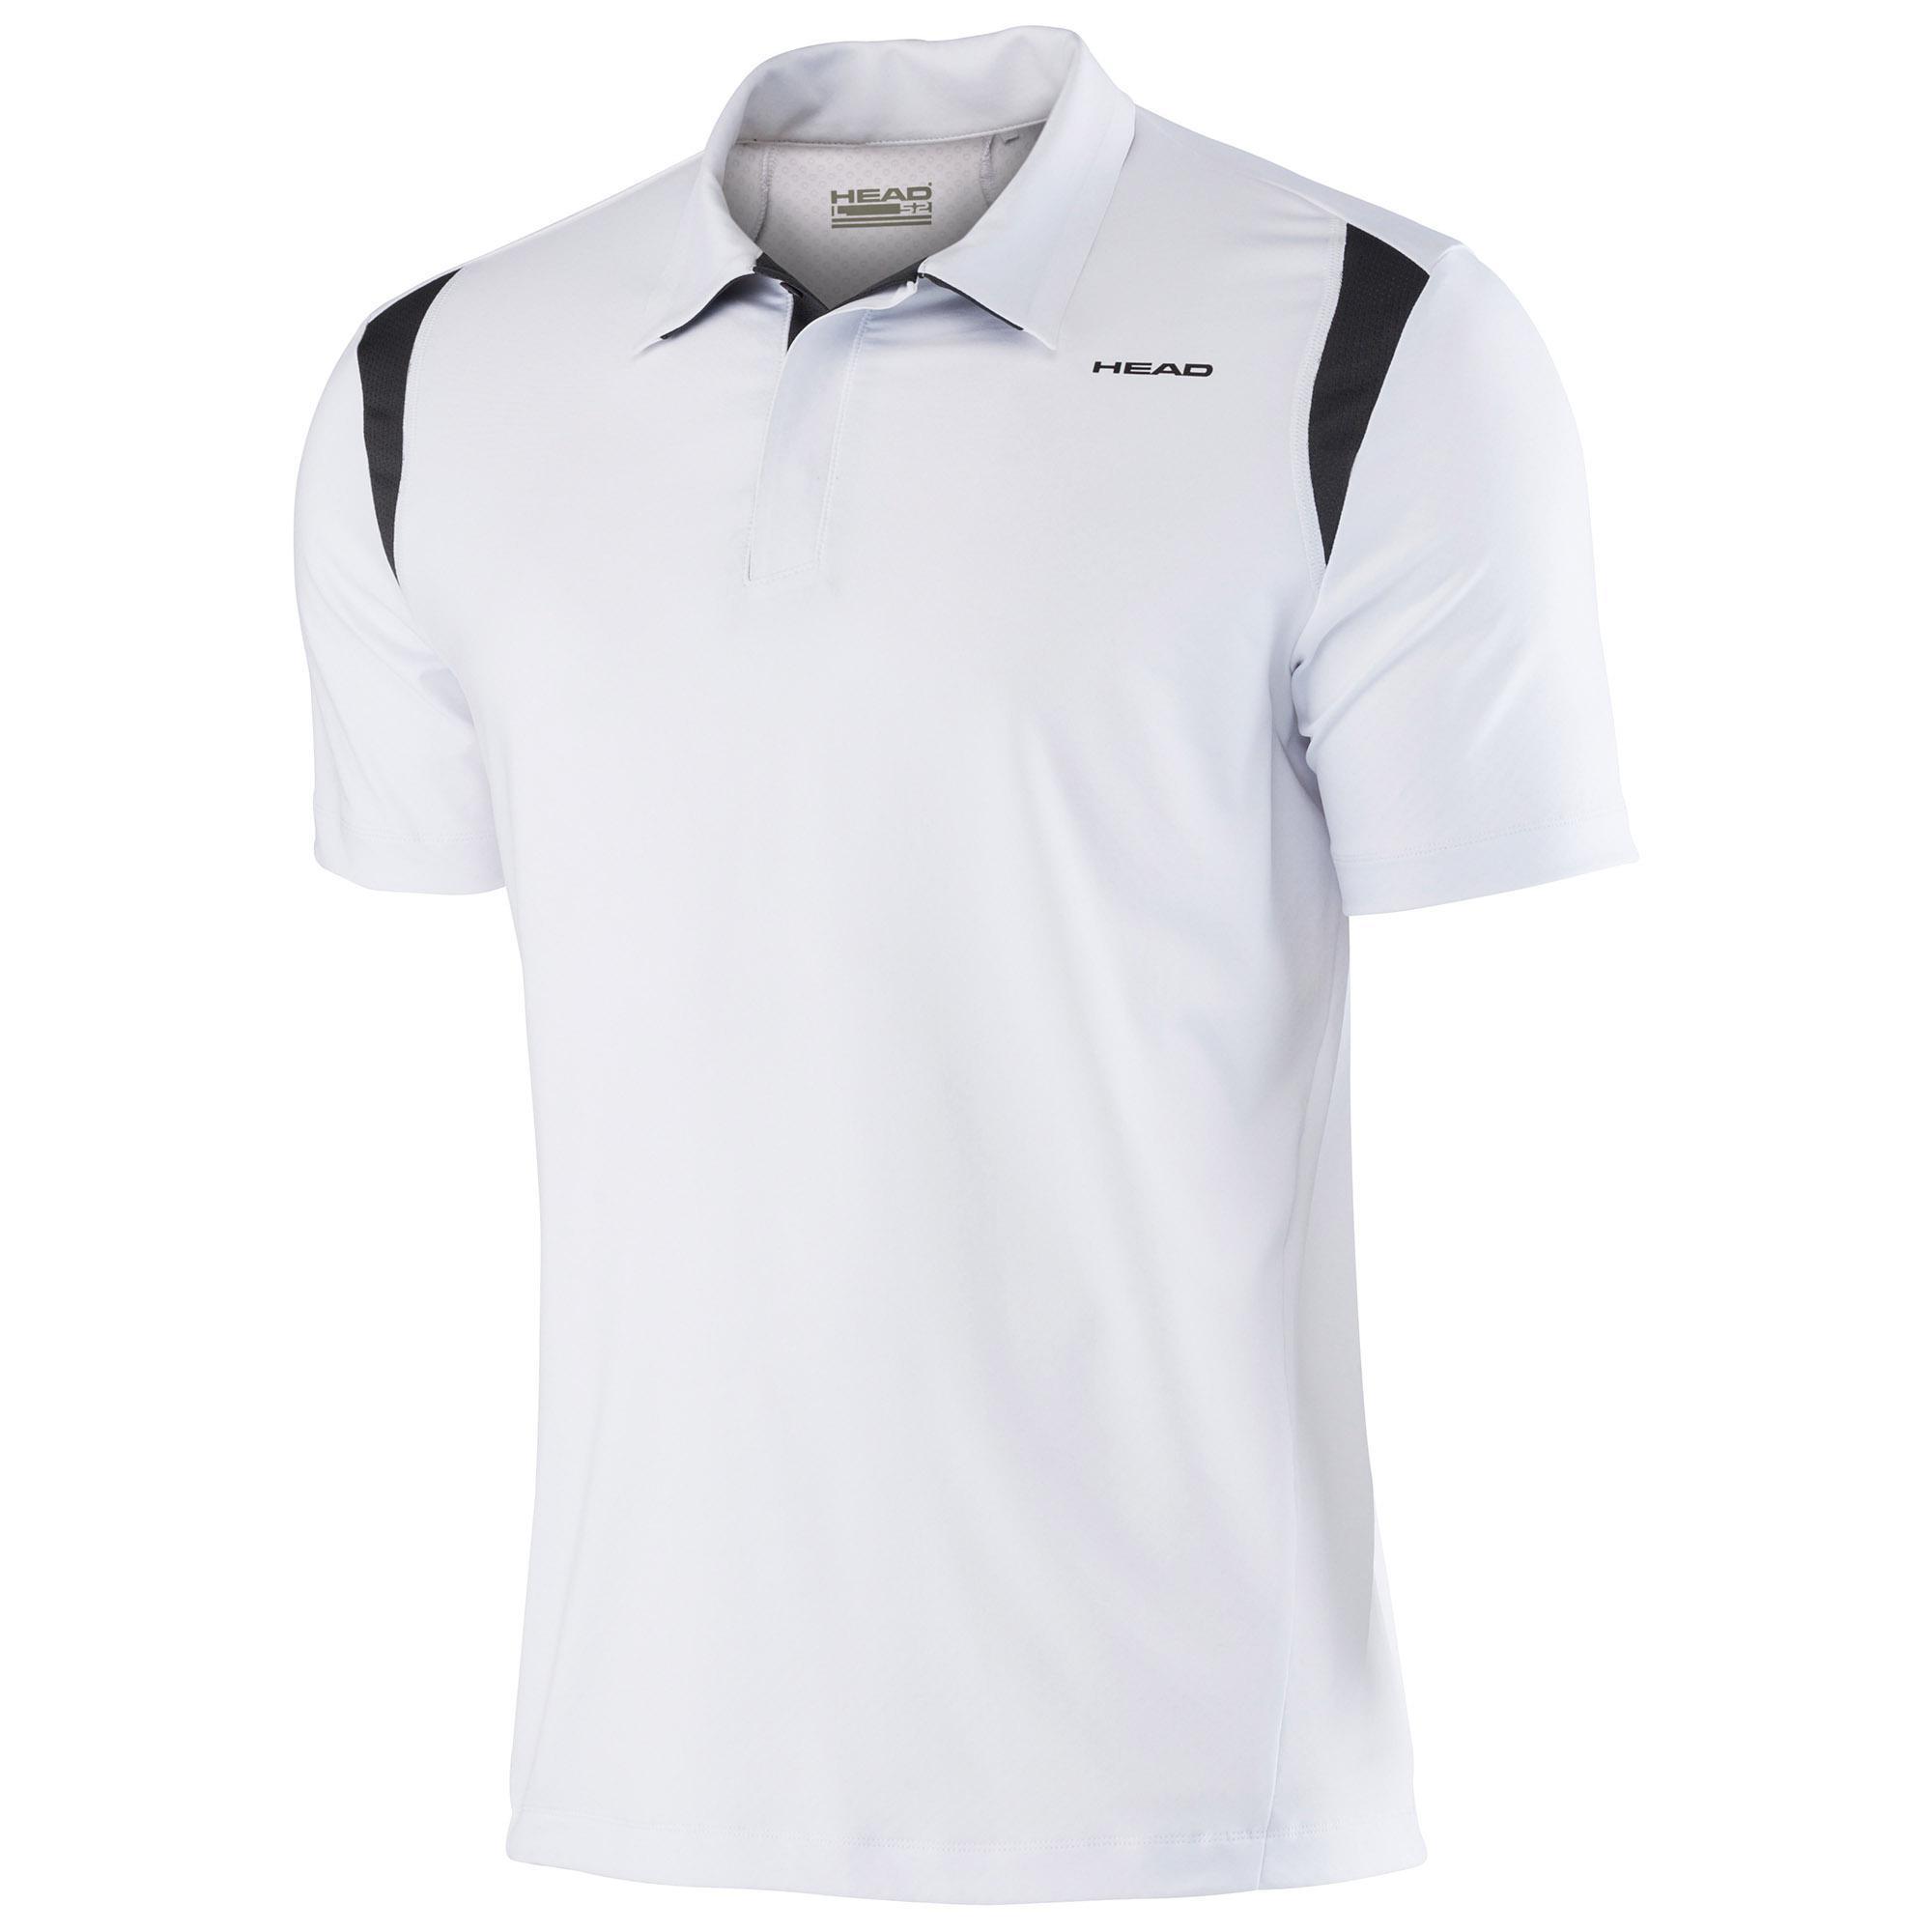 Head mens performance cool polo shirt white for Cool mens polo shirts